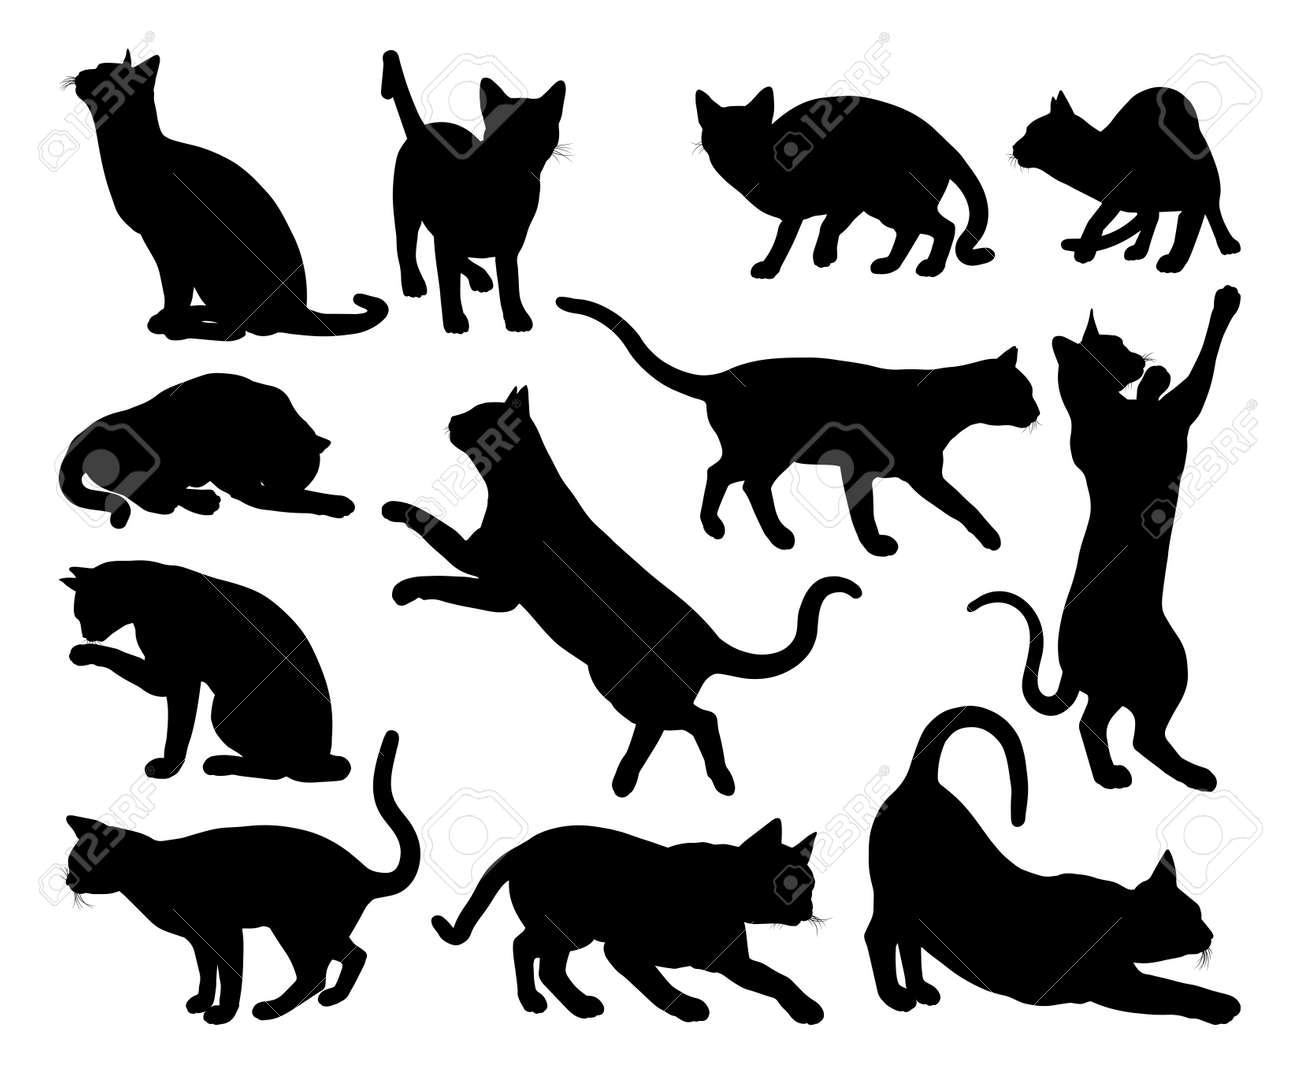 A cat silhouettes pet animals graphics set - 144728226